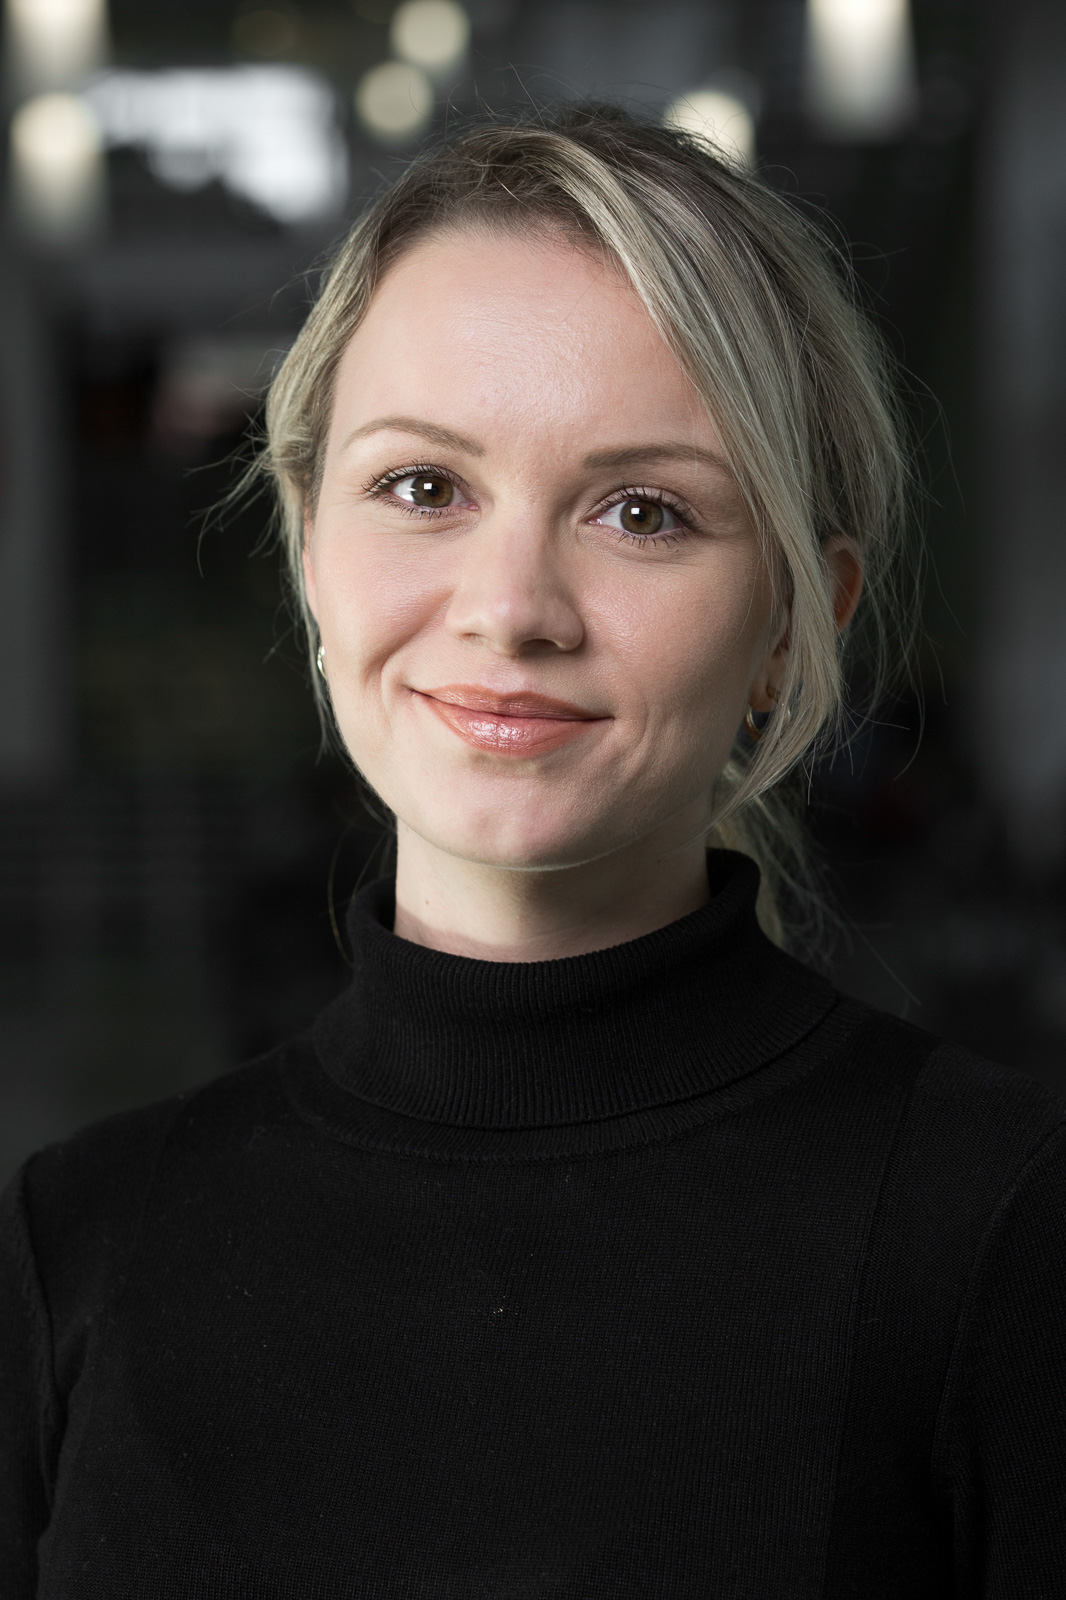 Annamaria Kubovcikova